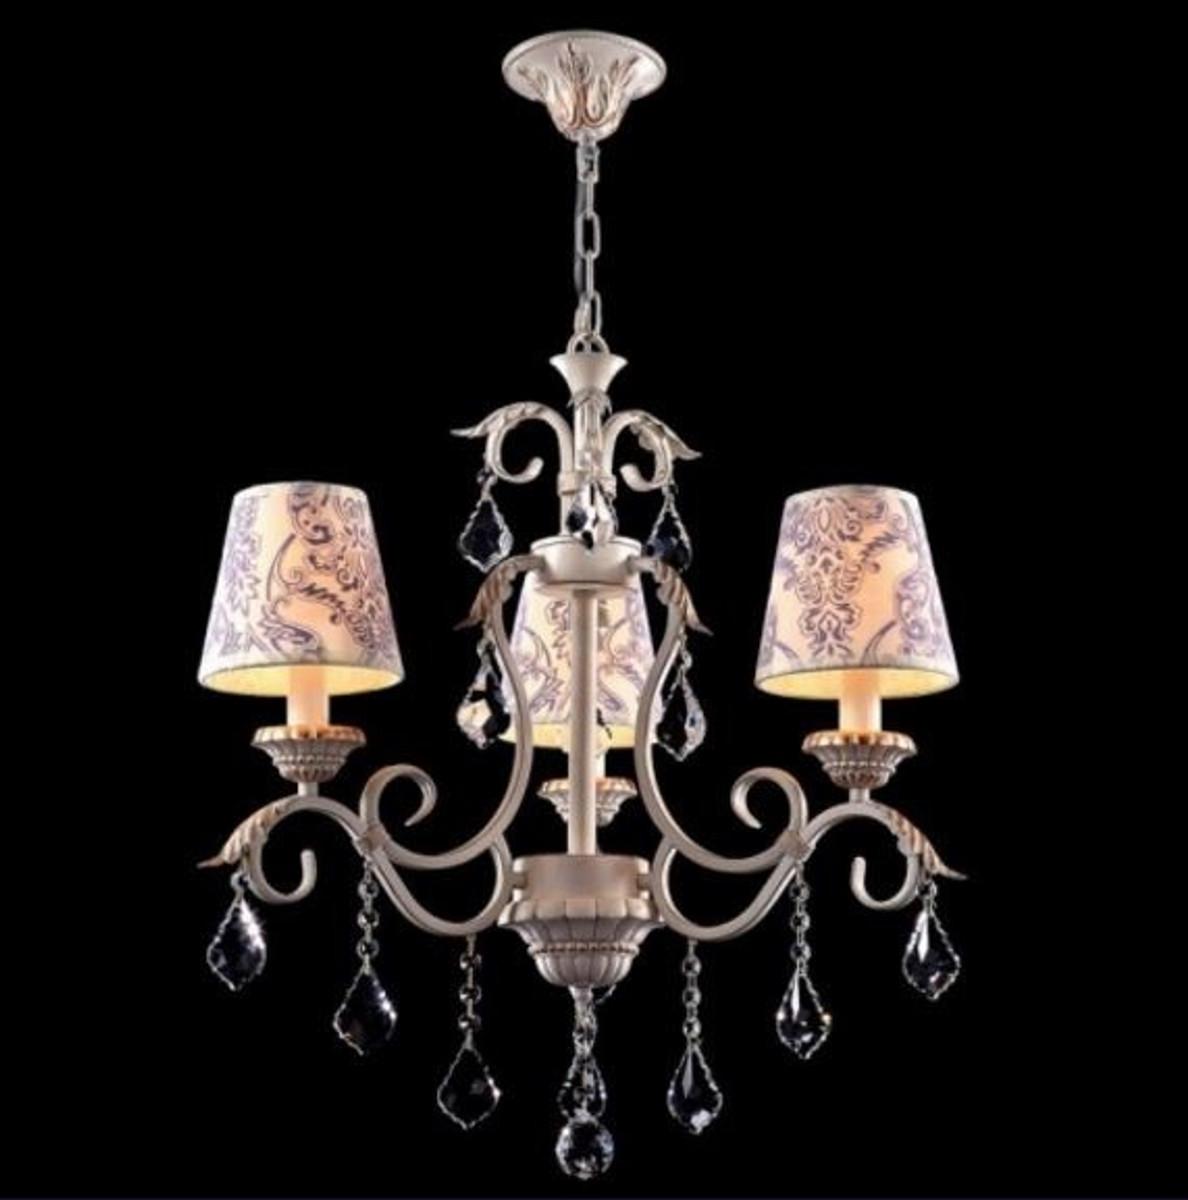 casa padrino barock decken kristall kronleuchter creme gold 58 x h 61 cm antik stil mbel lster leuchter deckenleuchte hngelampe - Kronleuchter Deckenleuchte